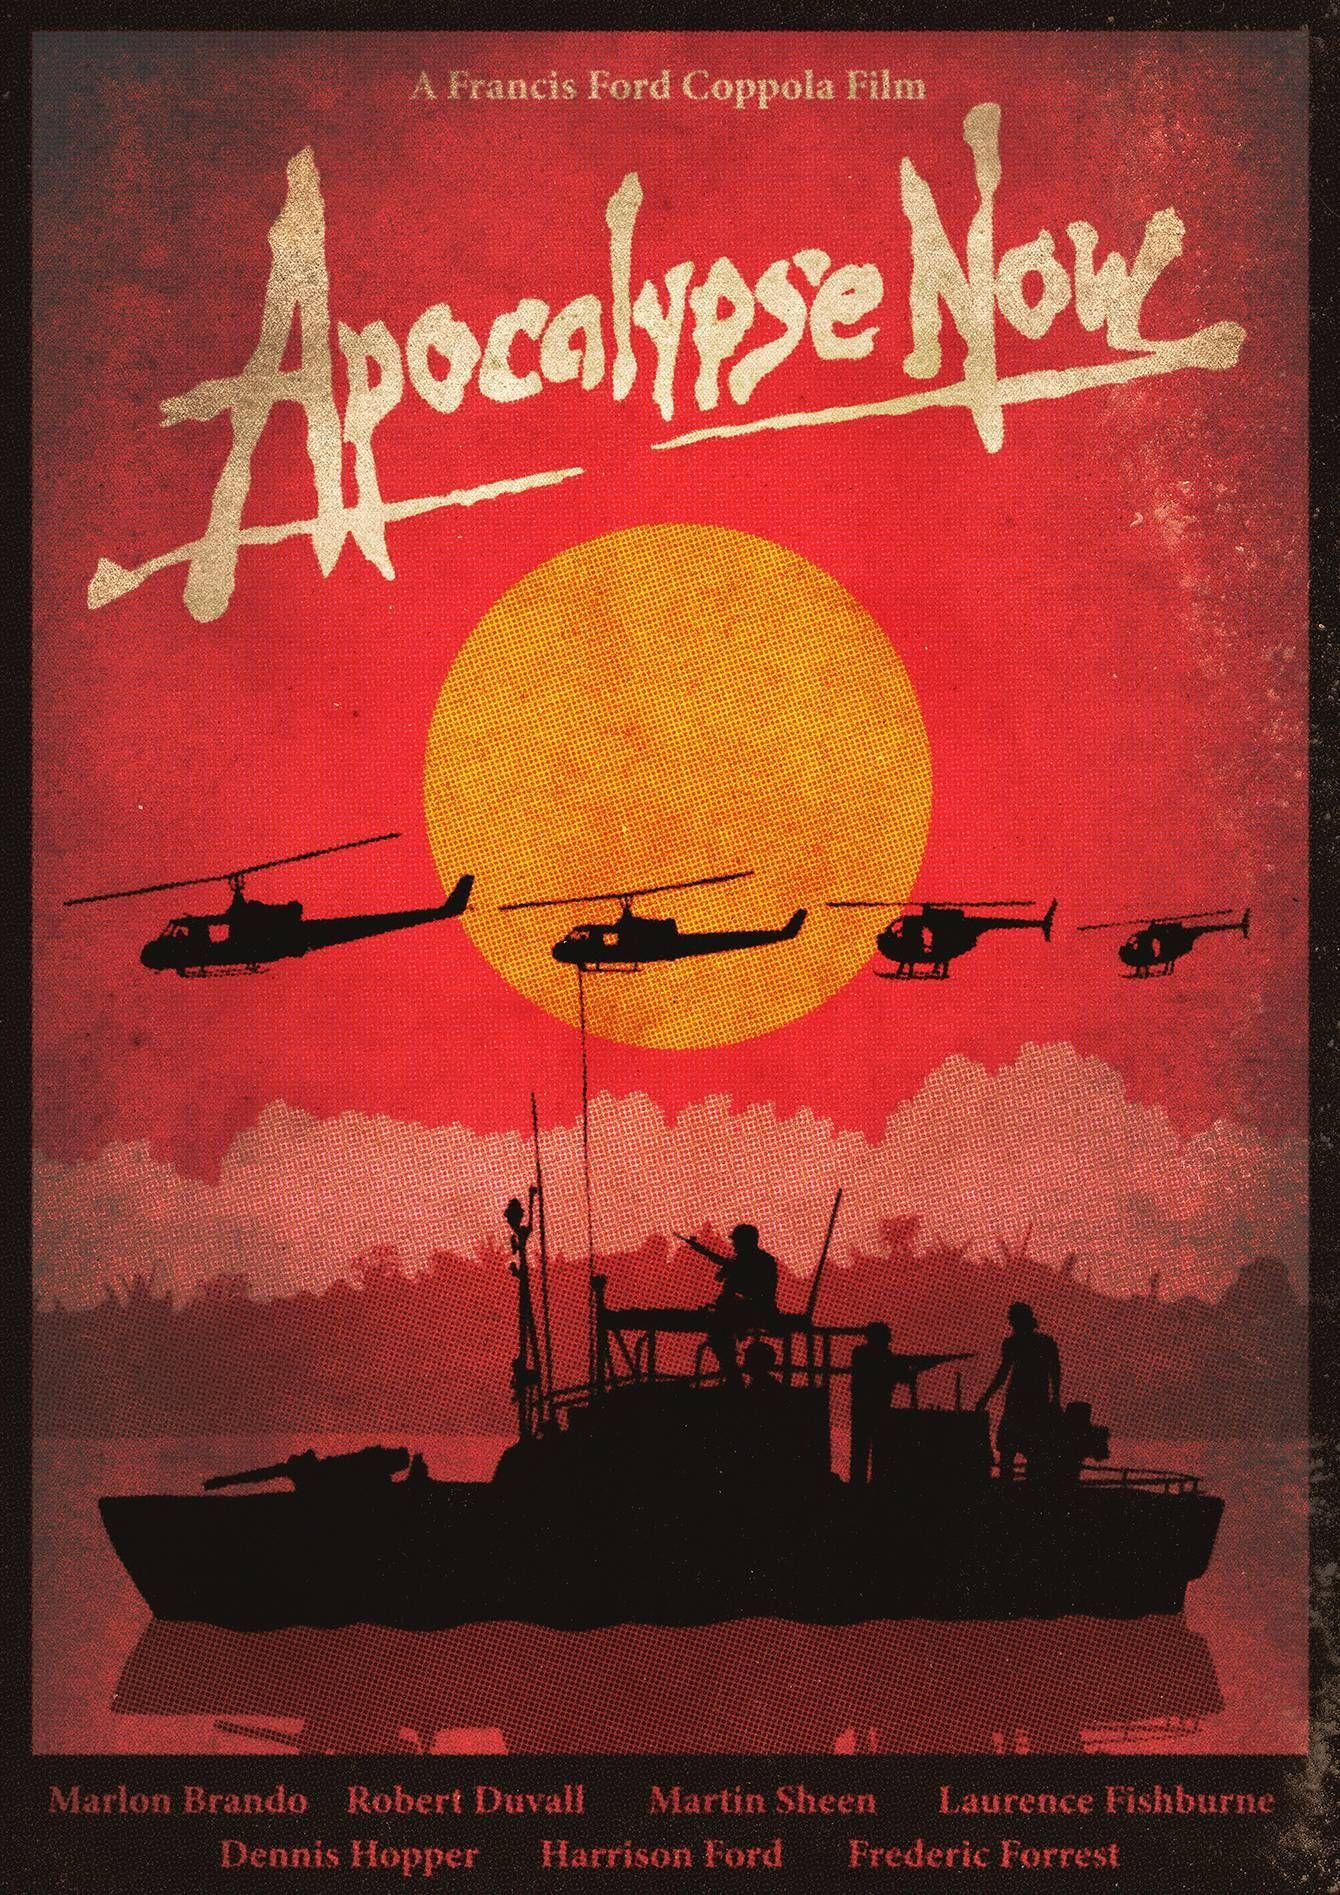 70s poster apocalypse now 1979 francis ford coppola dir